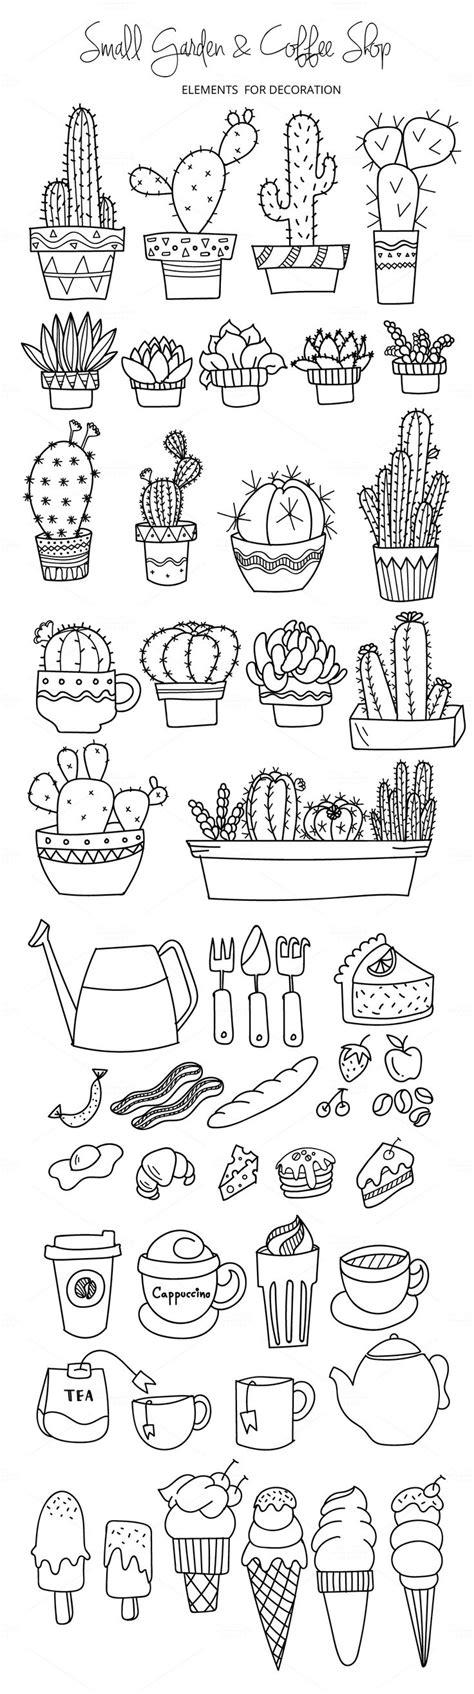 Stiker Pengiriman Shop Black Doodle small garden coffee shop illustrations cactus clip cacti and doodles